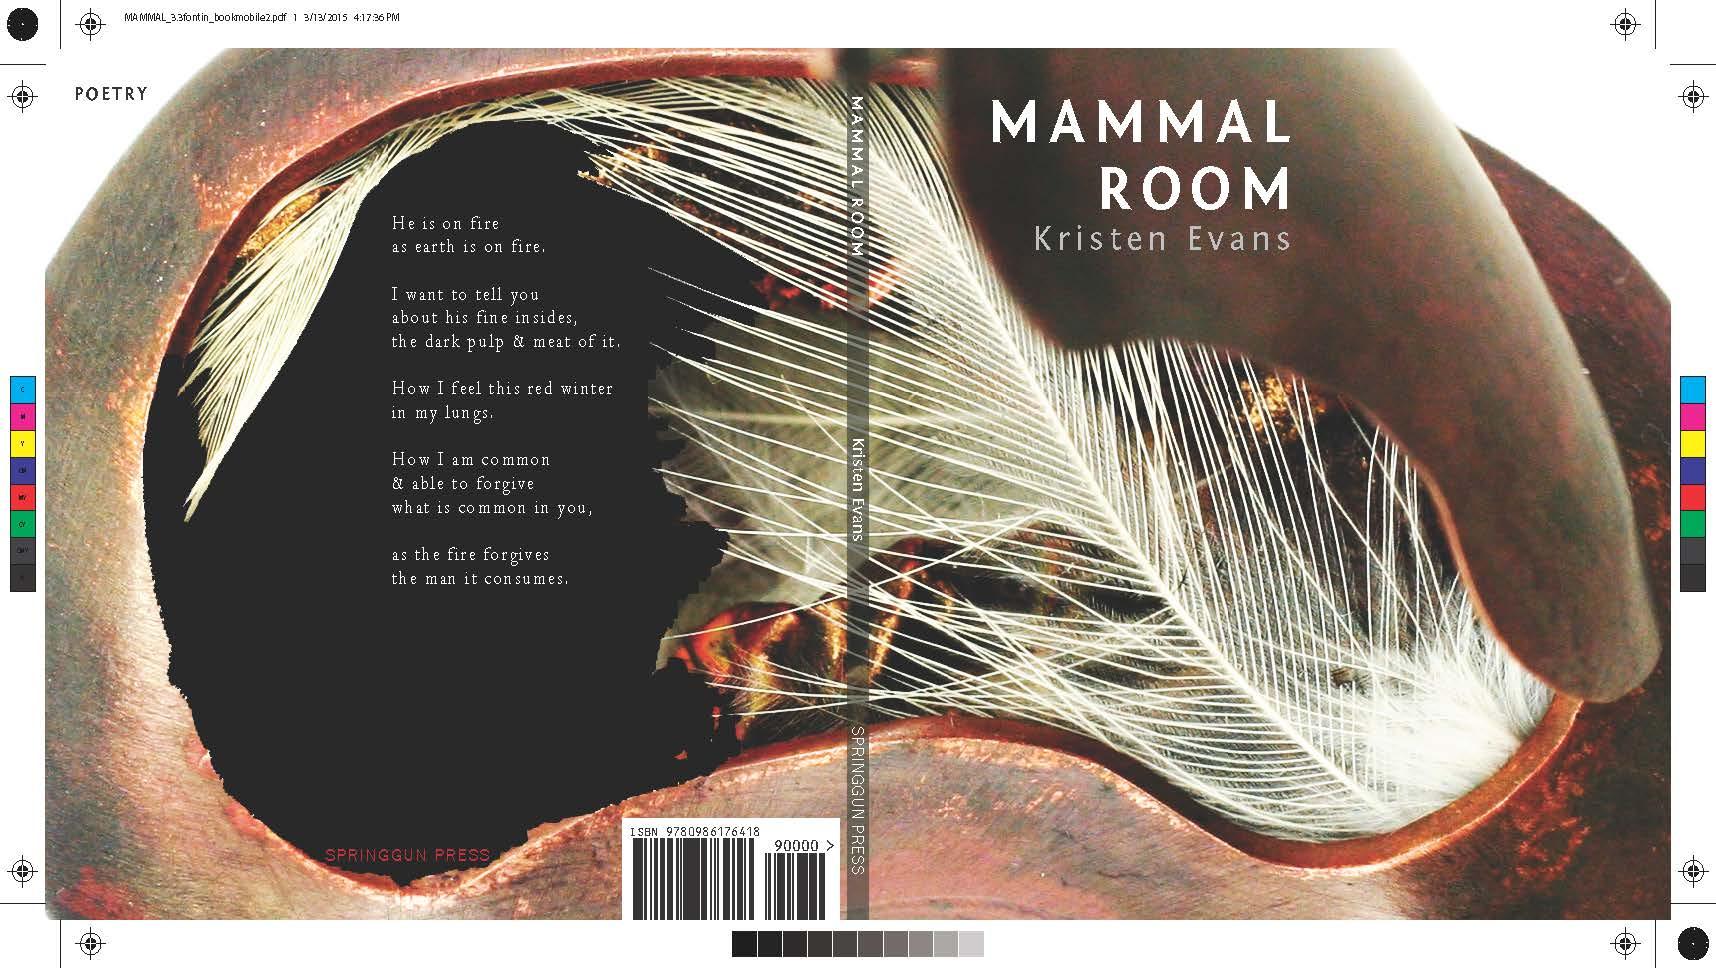 MAMMAL_3.3fontin_bookmobile2